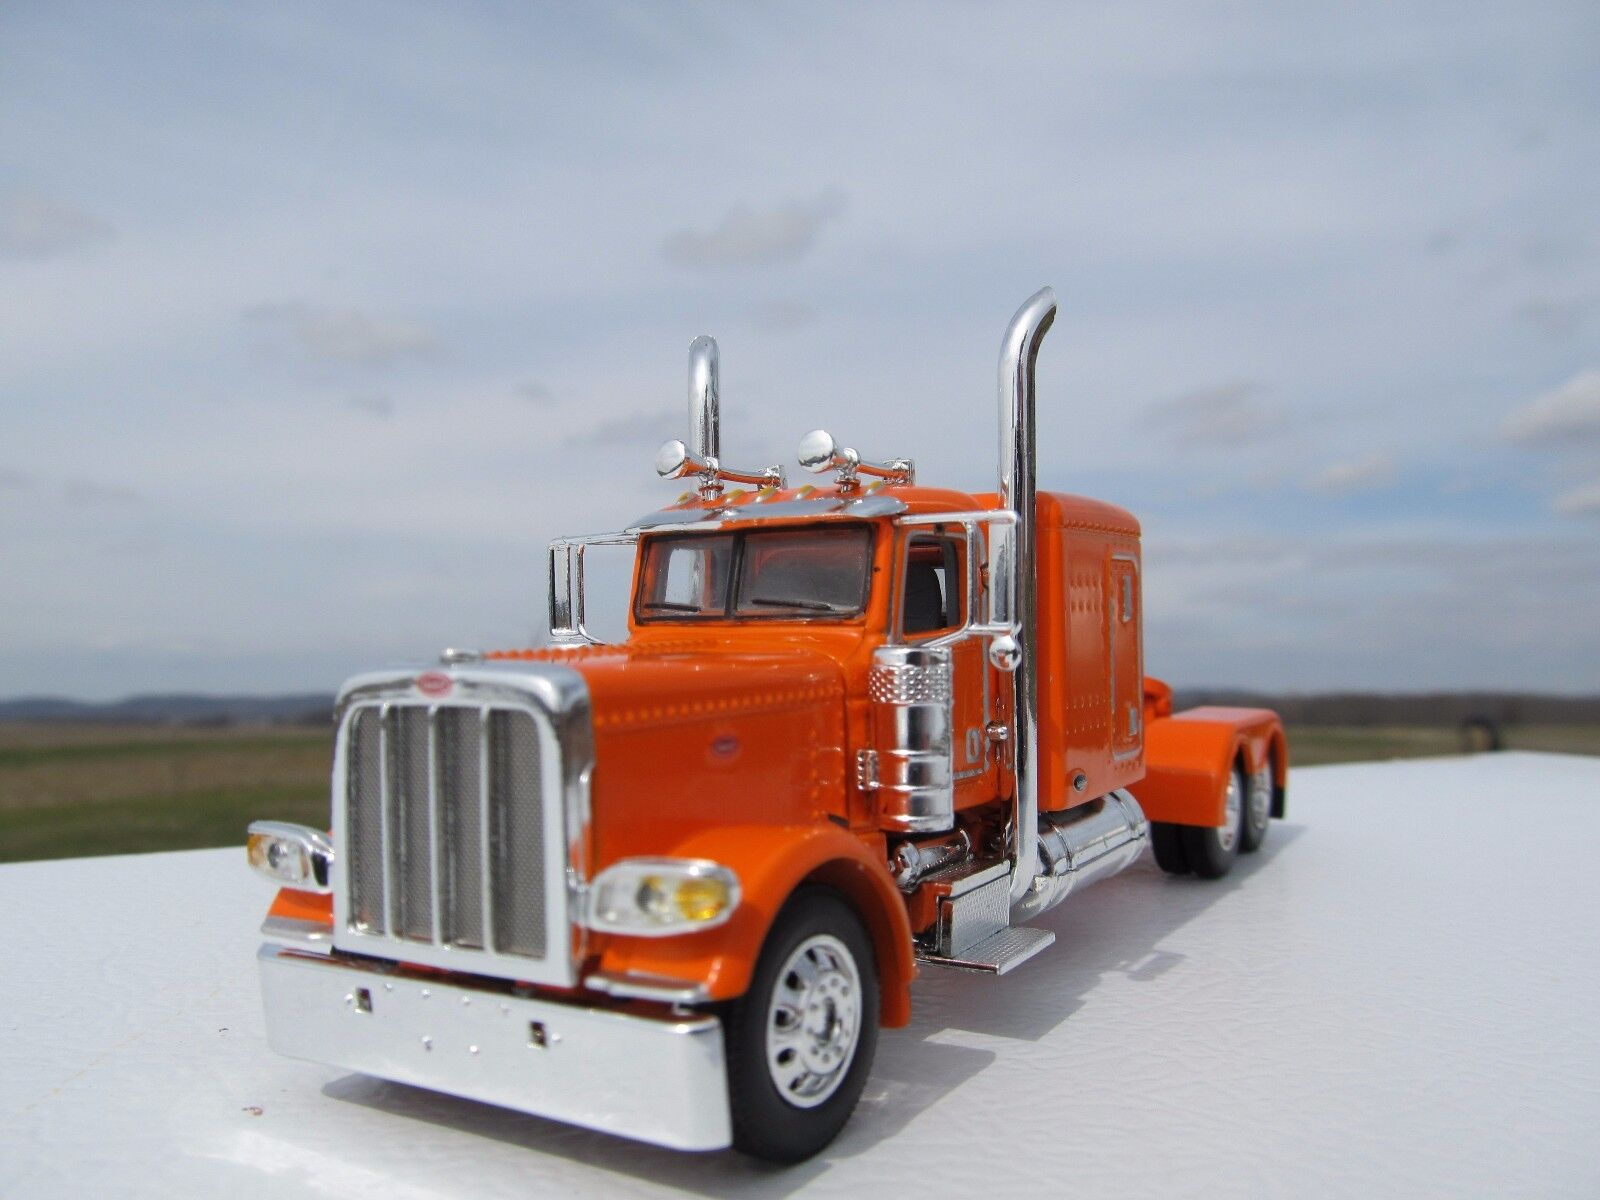 Dcp Escala 1 64 389 Peterbilt 63  Bunk (cabina de día optar) Naranja